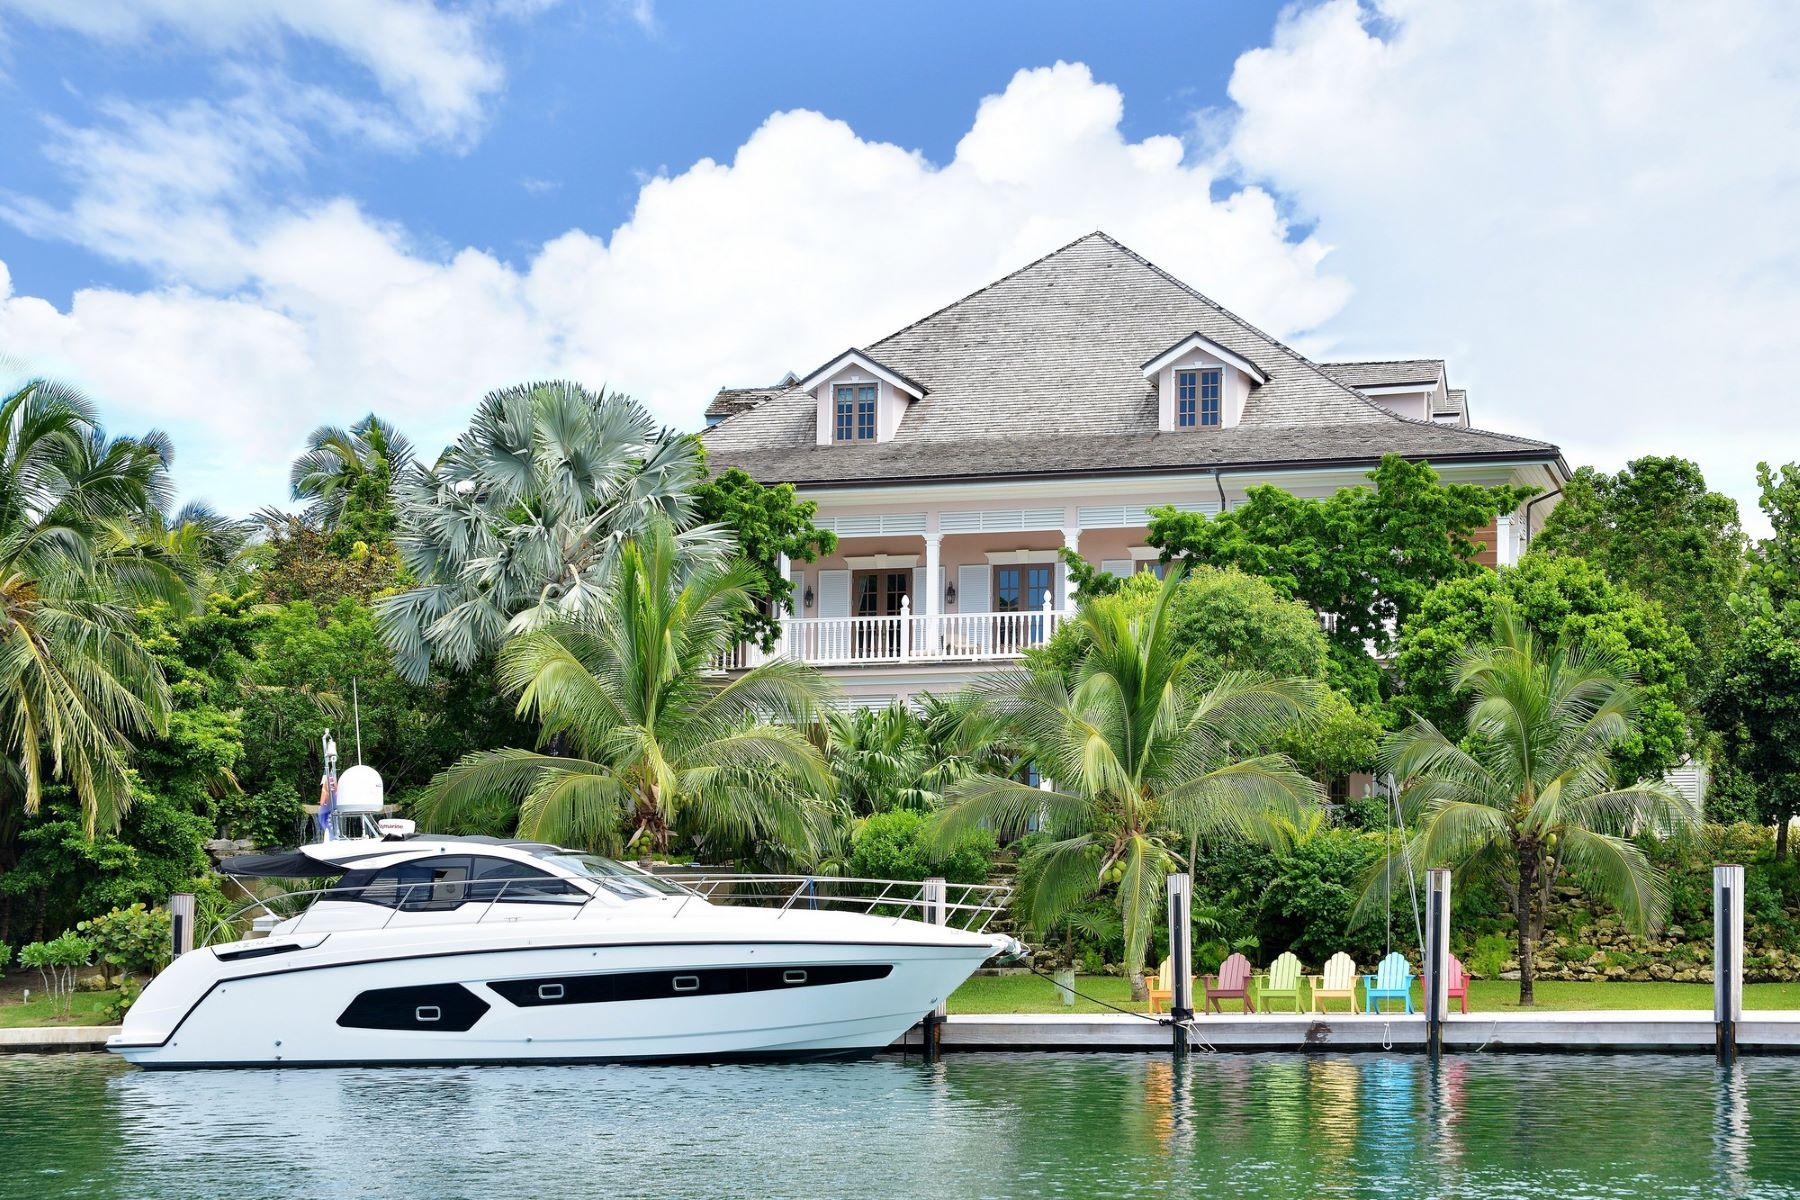 Casa Unifamiliar por un Venta en Deja Vu Deja Vu Shamrock Road Lyford Cay, Nueva Providencia / Nassau . Bahamas